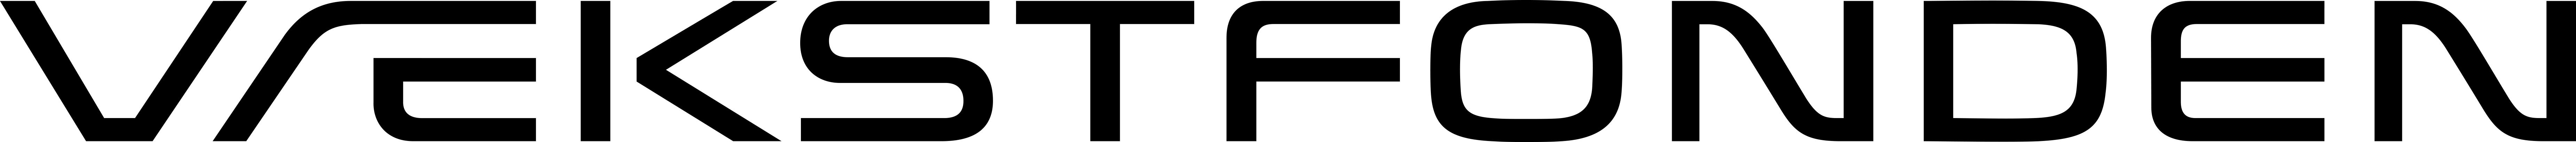 Vækstfondens_logo_sort